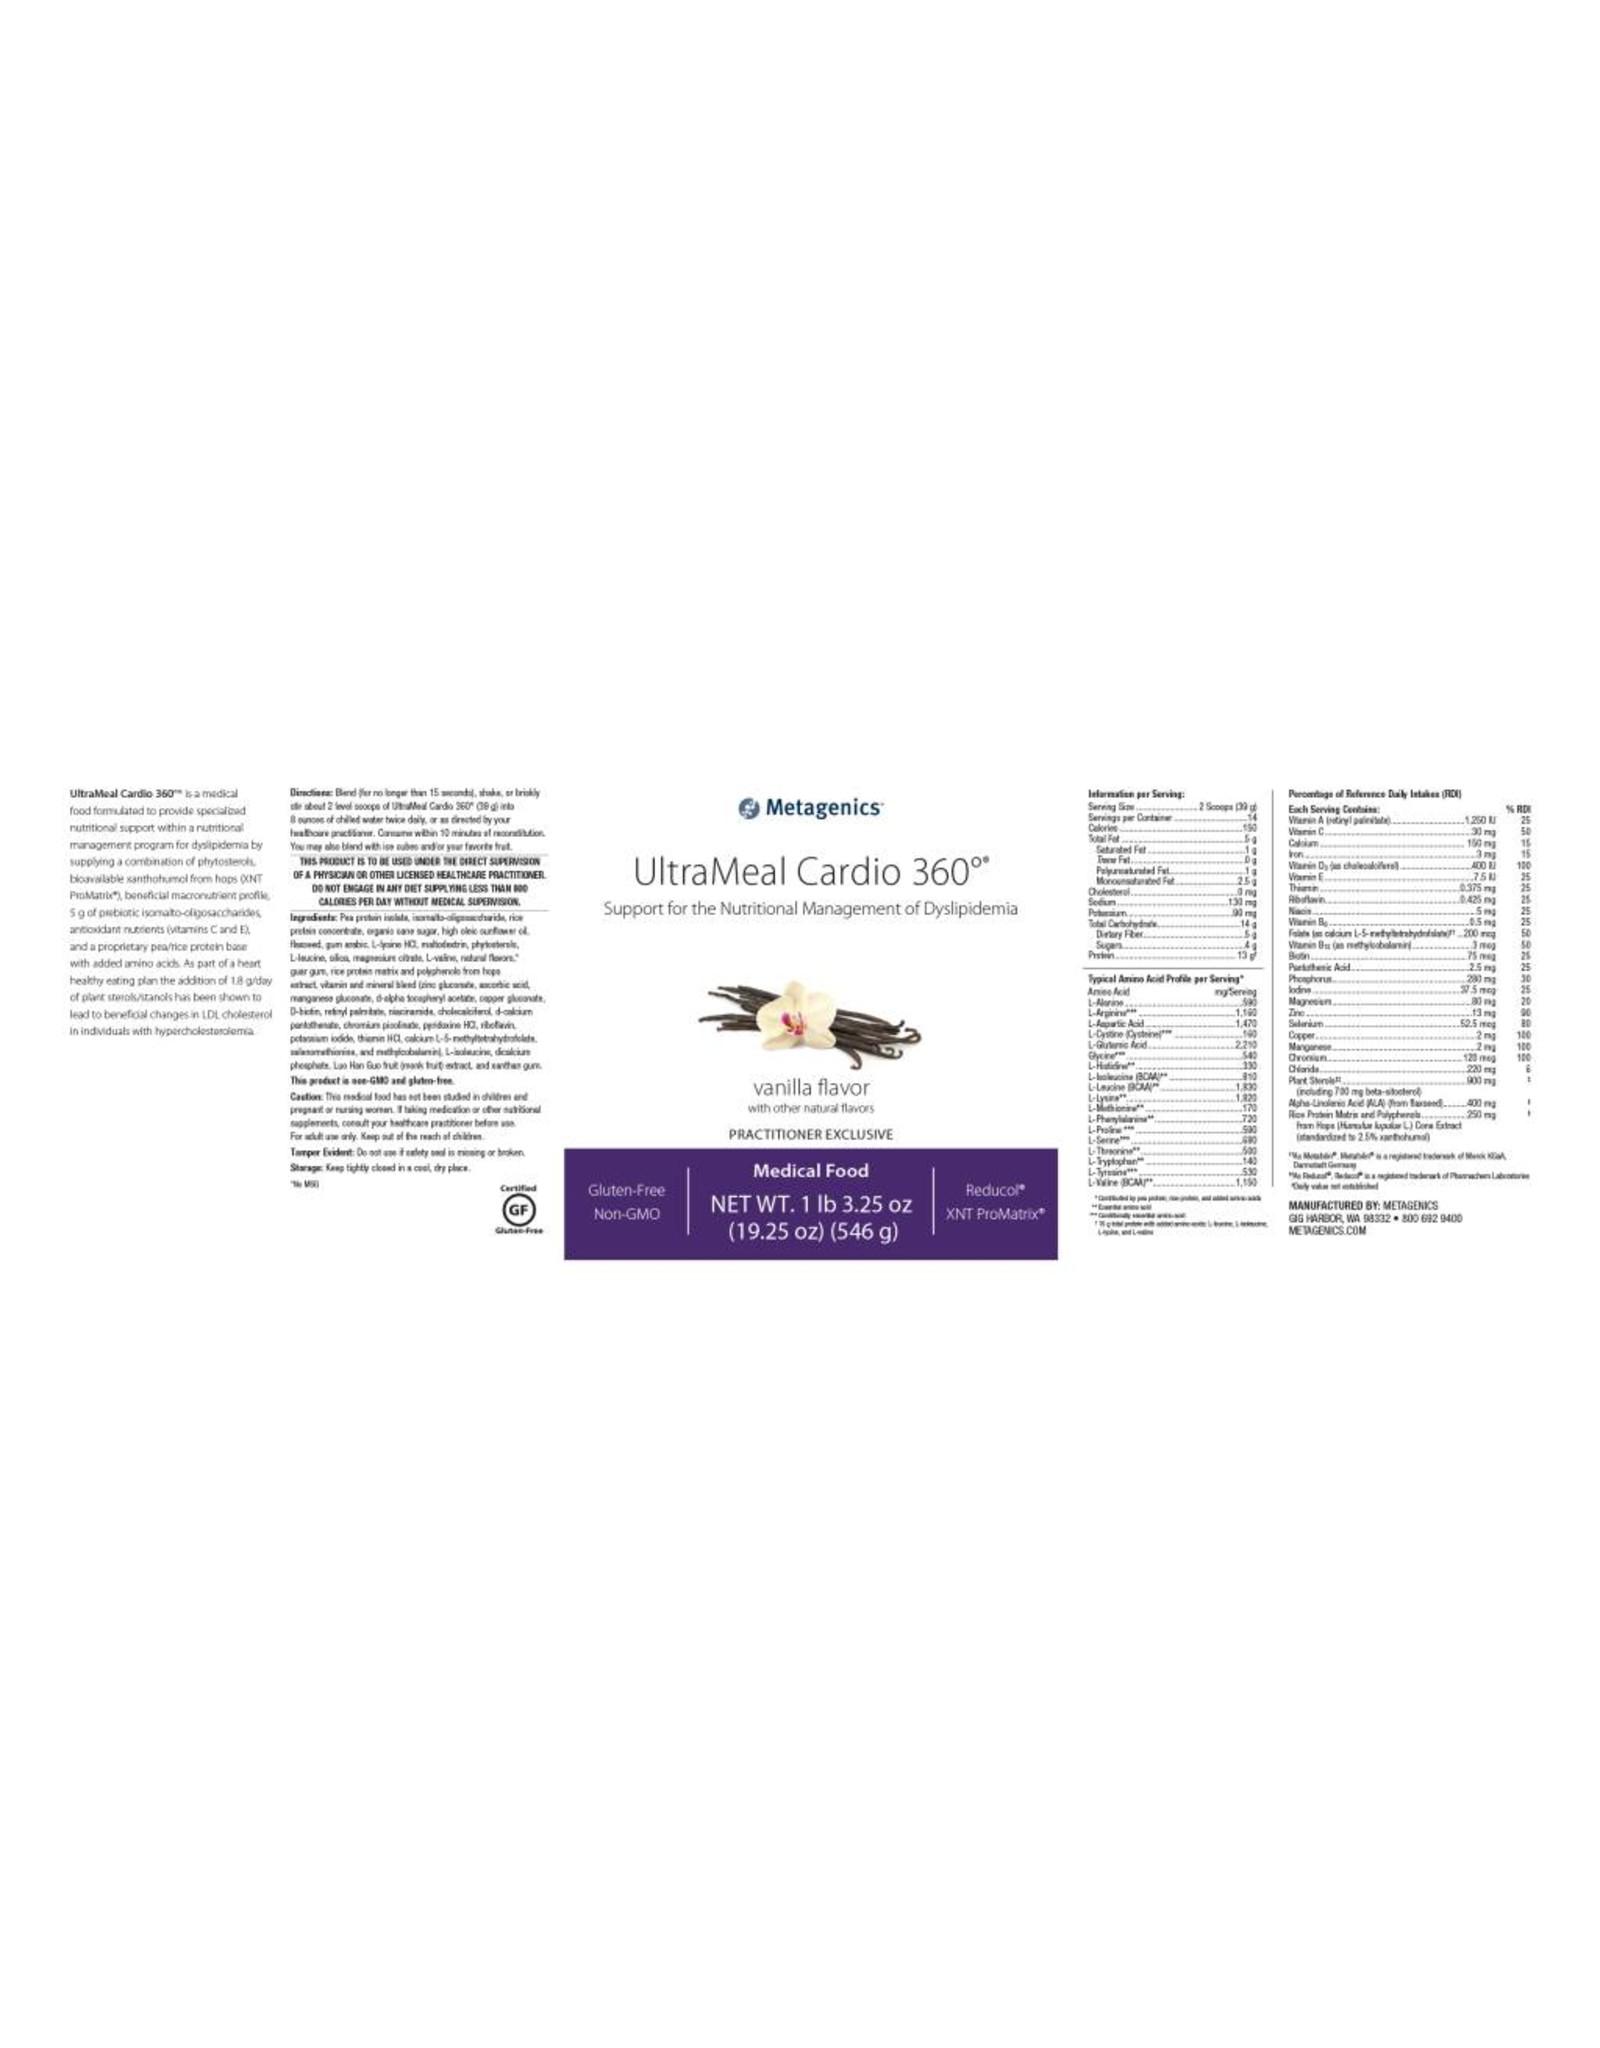 UltraMeal® Cardio 360™